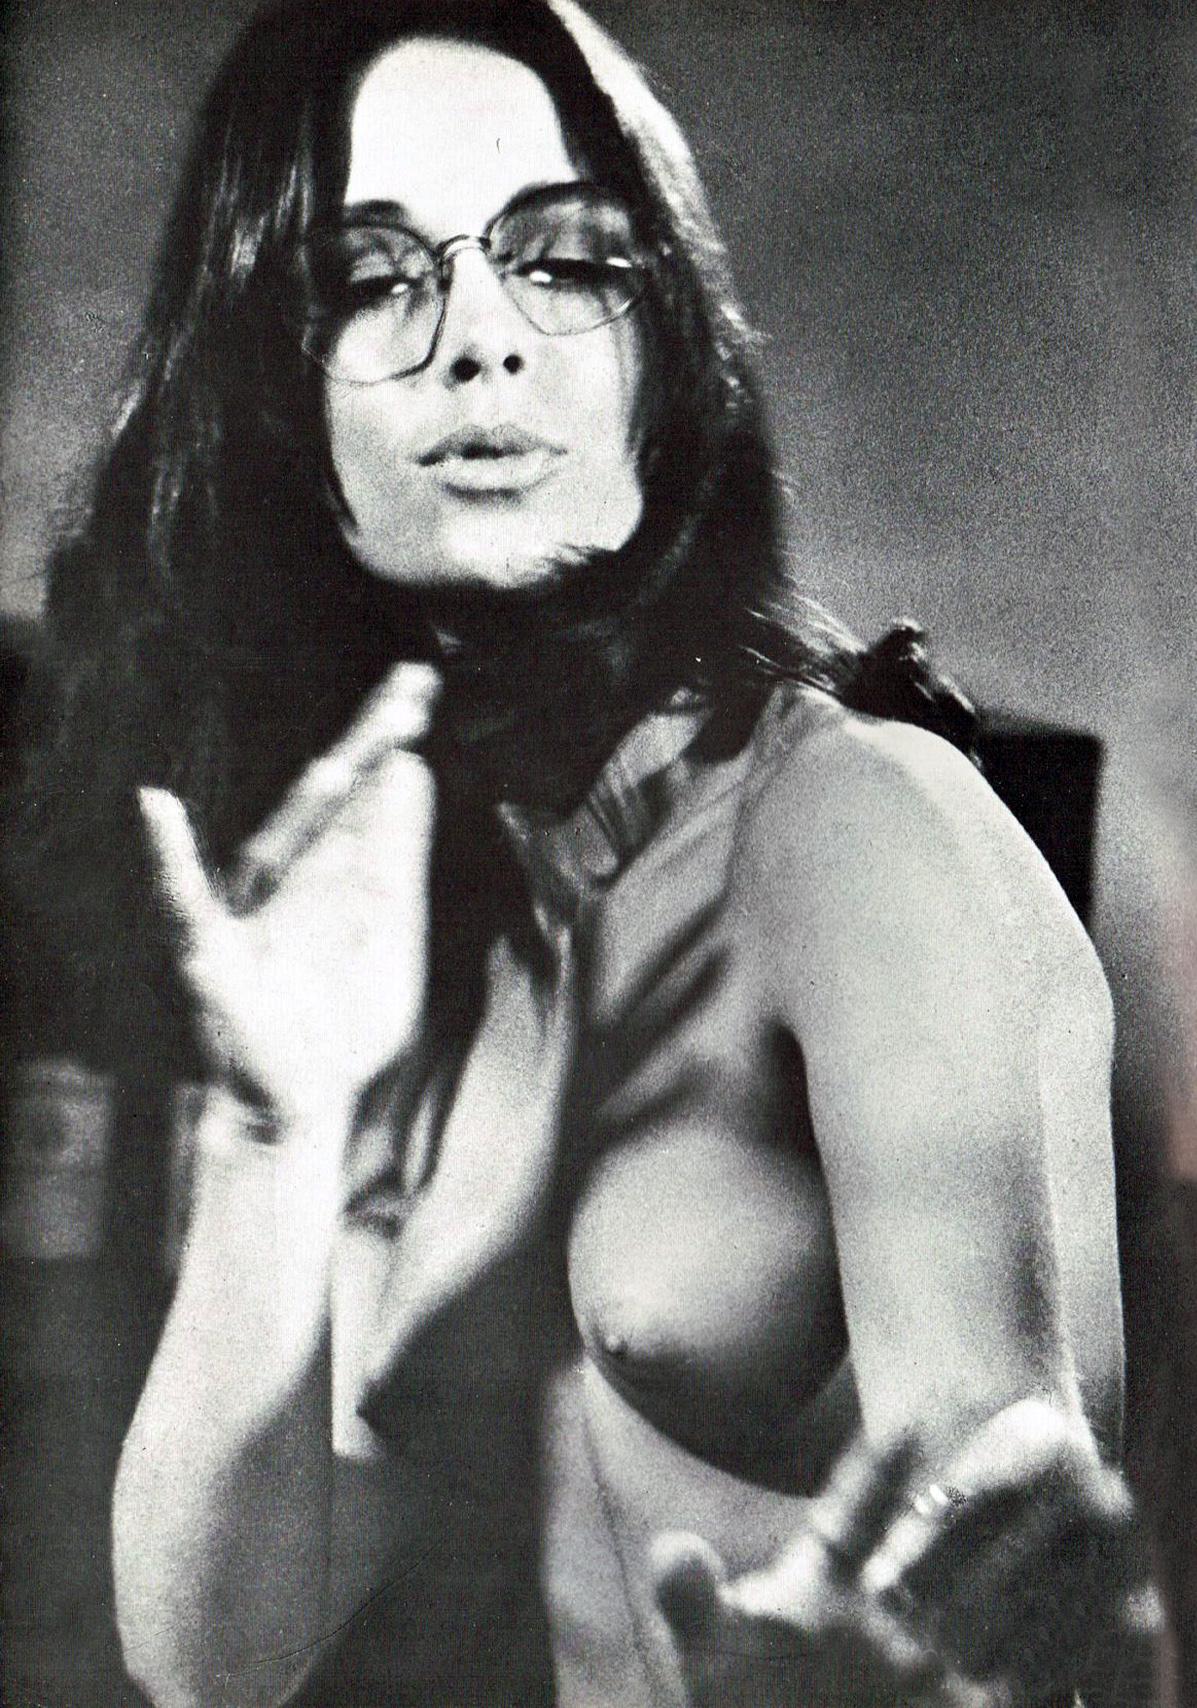 Joanna Cameron topless BS I LOVE you 3.jpg